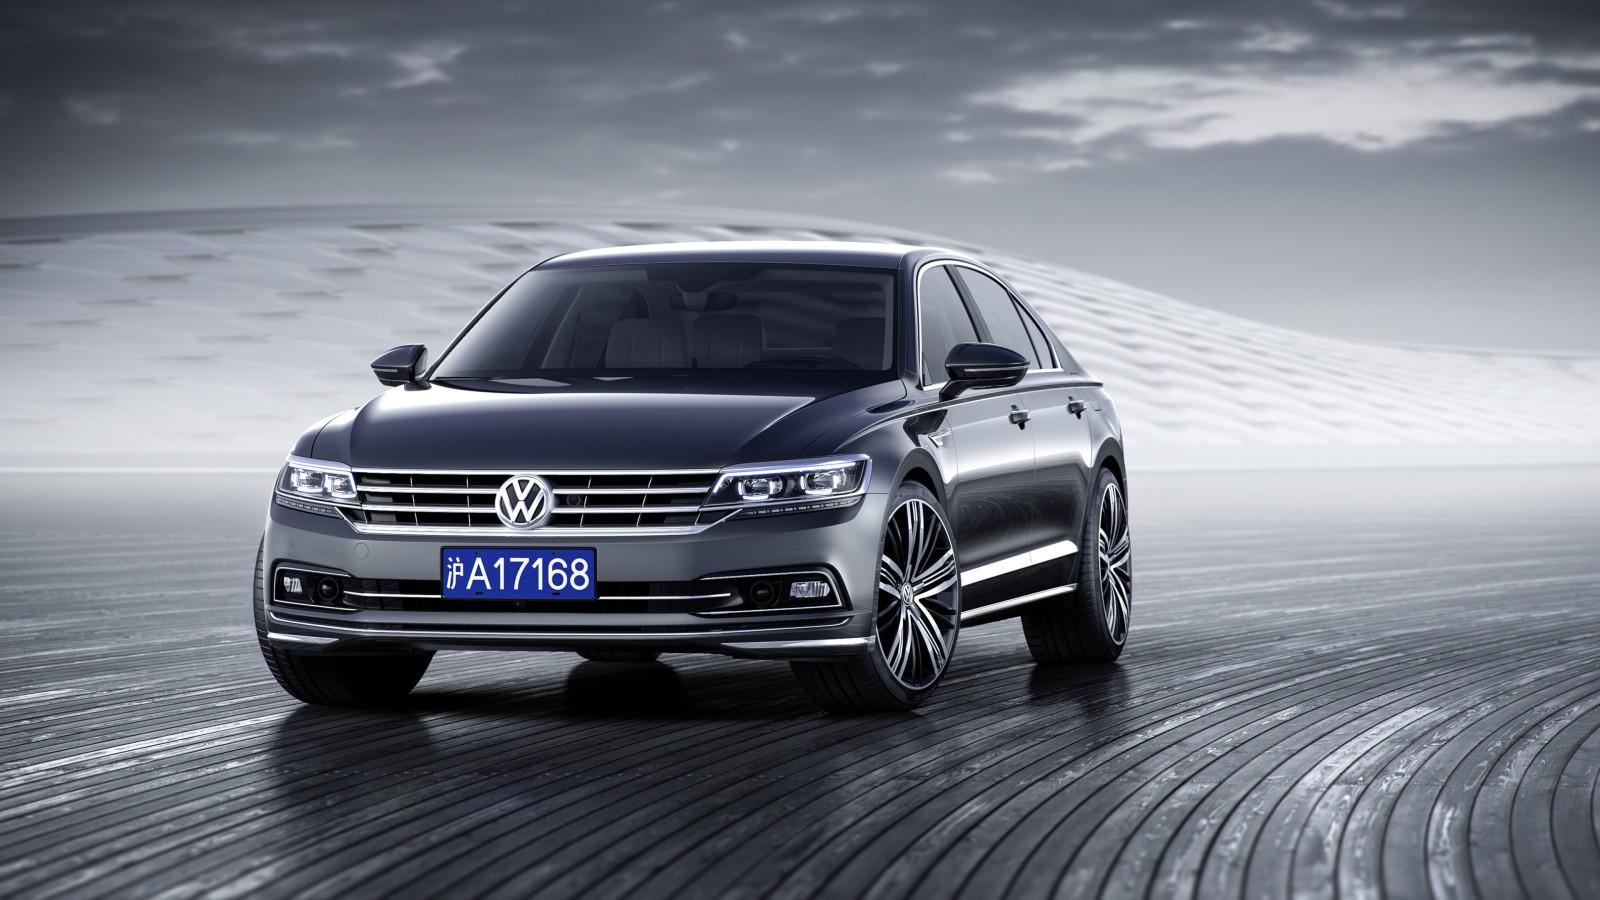 Luxurious Vw Sport Full Hd Car Wallpapers: 2017 Volkswagen Phideon Luxury Sedan Wallpaper